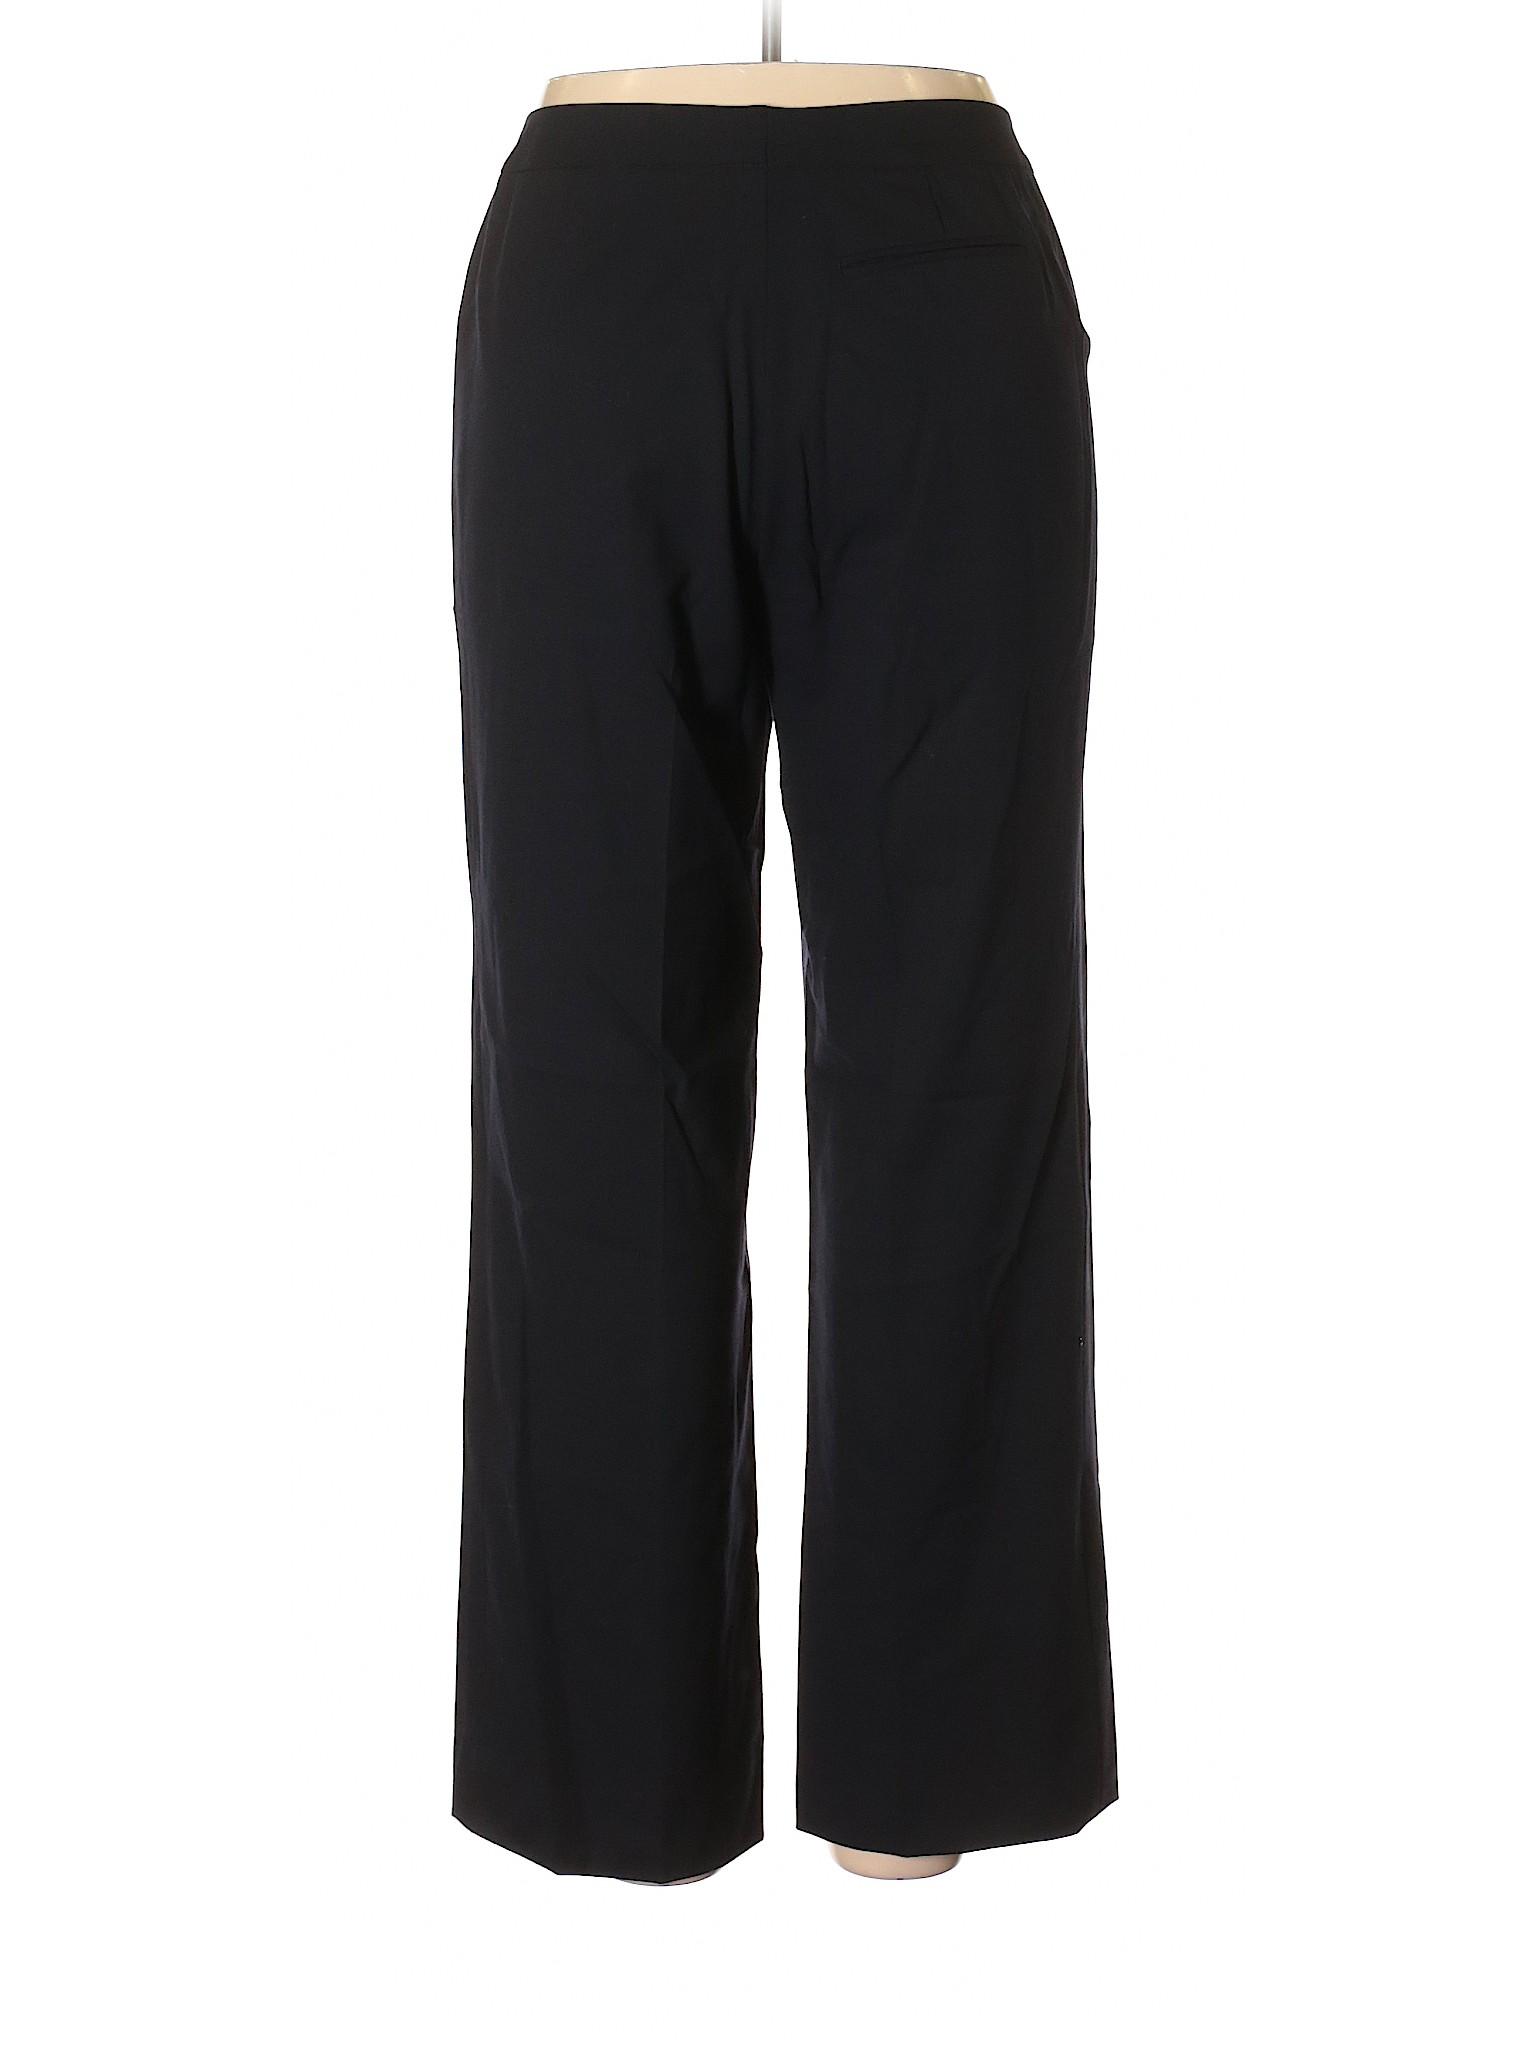 148 New Dress Lafayette York leisure Pants Boutique gwaEq1OzO